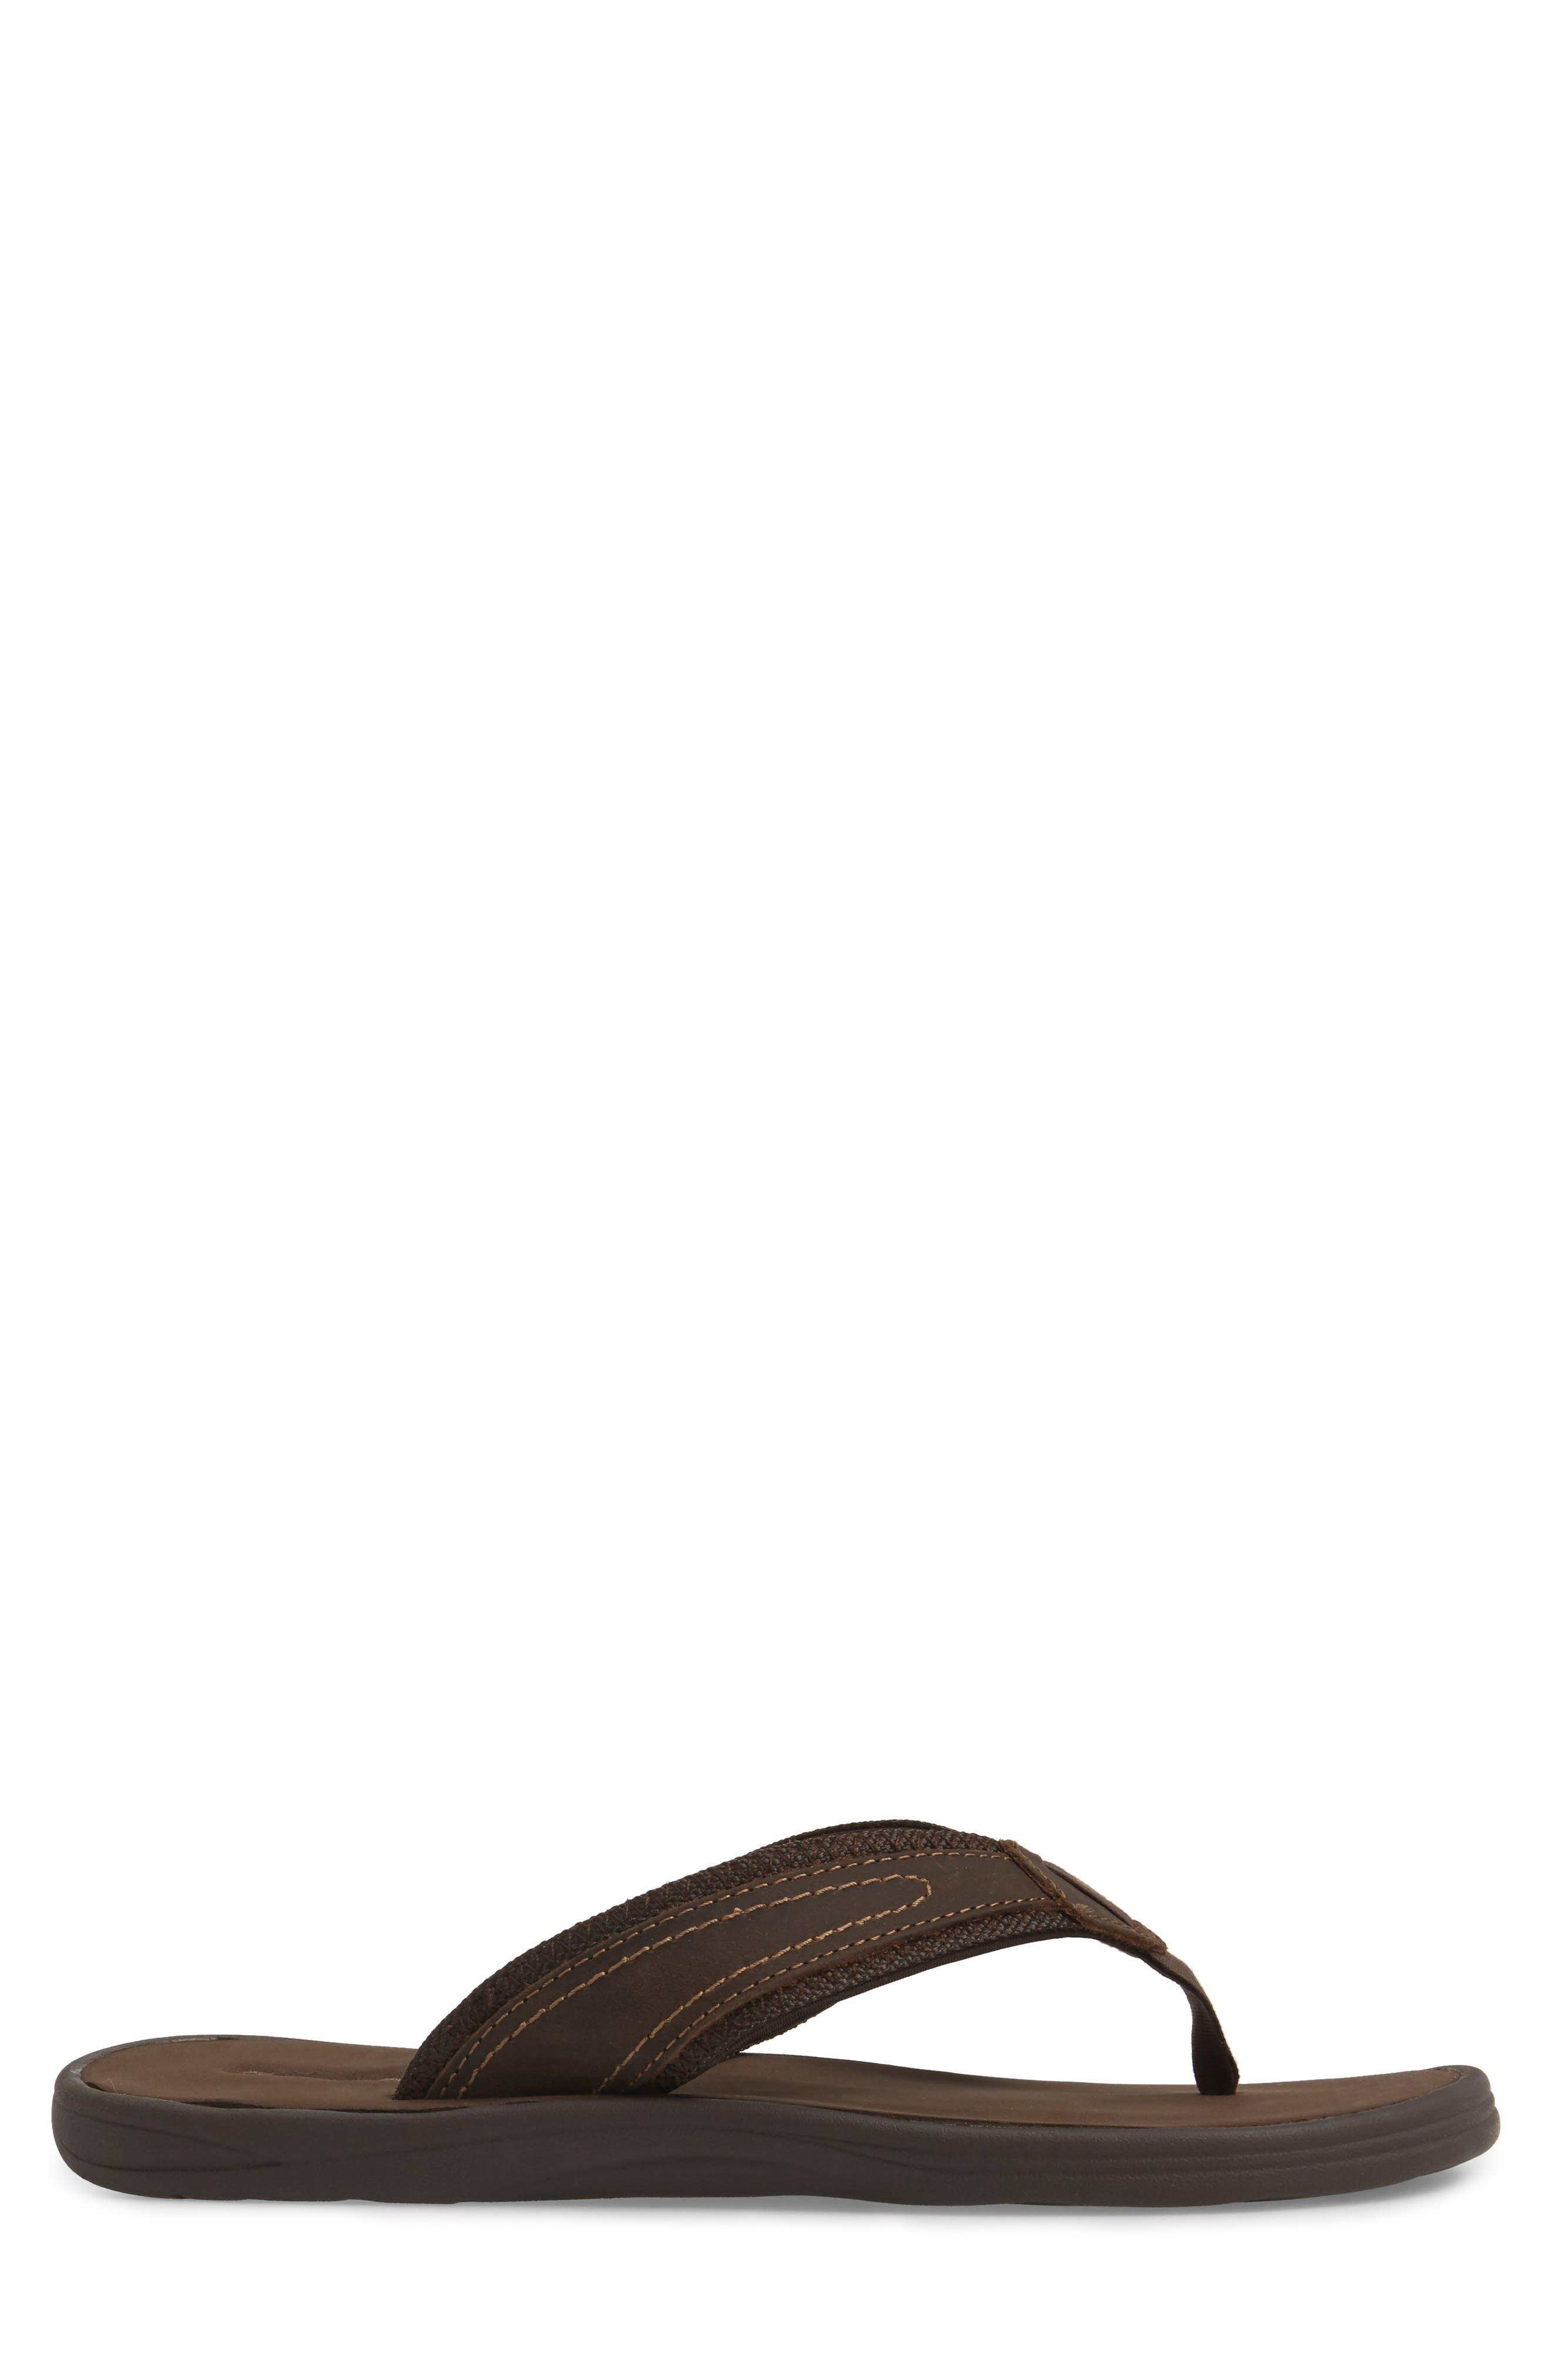 Seawell Flip Flop,                             Alternate thumbnail 8, color,